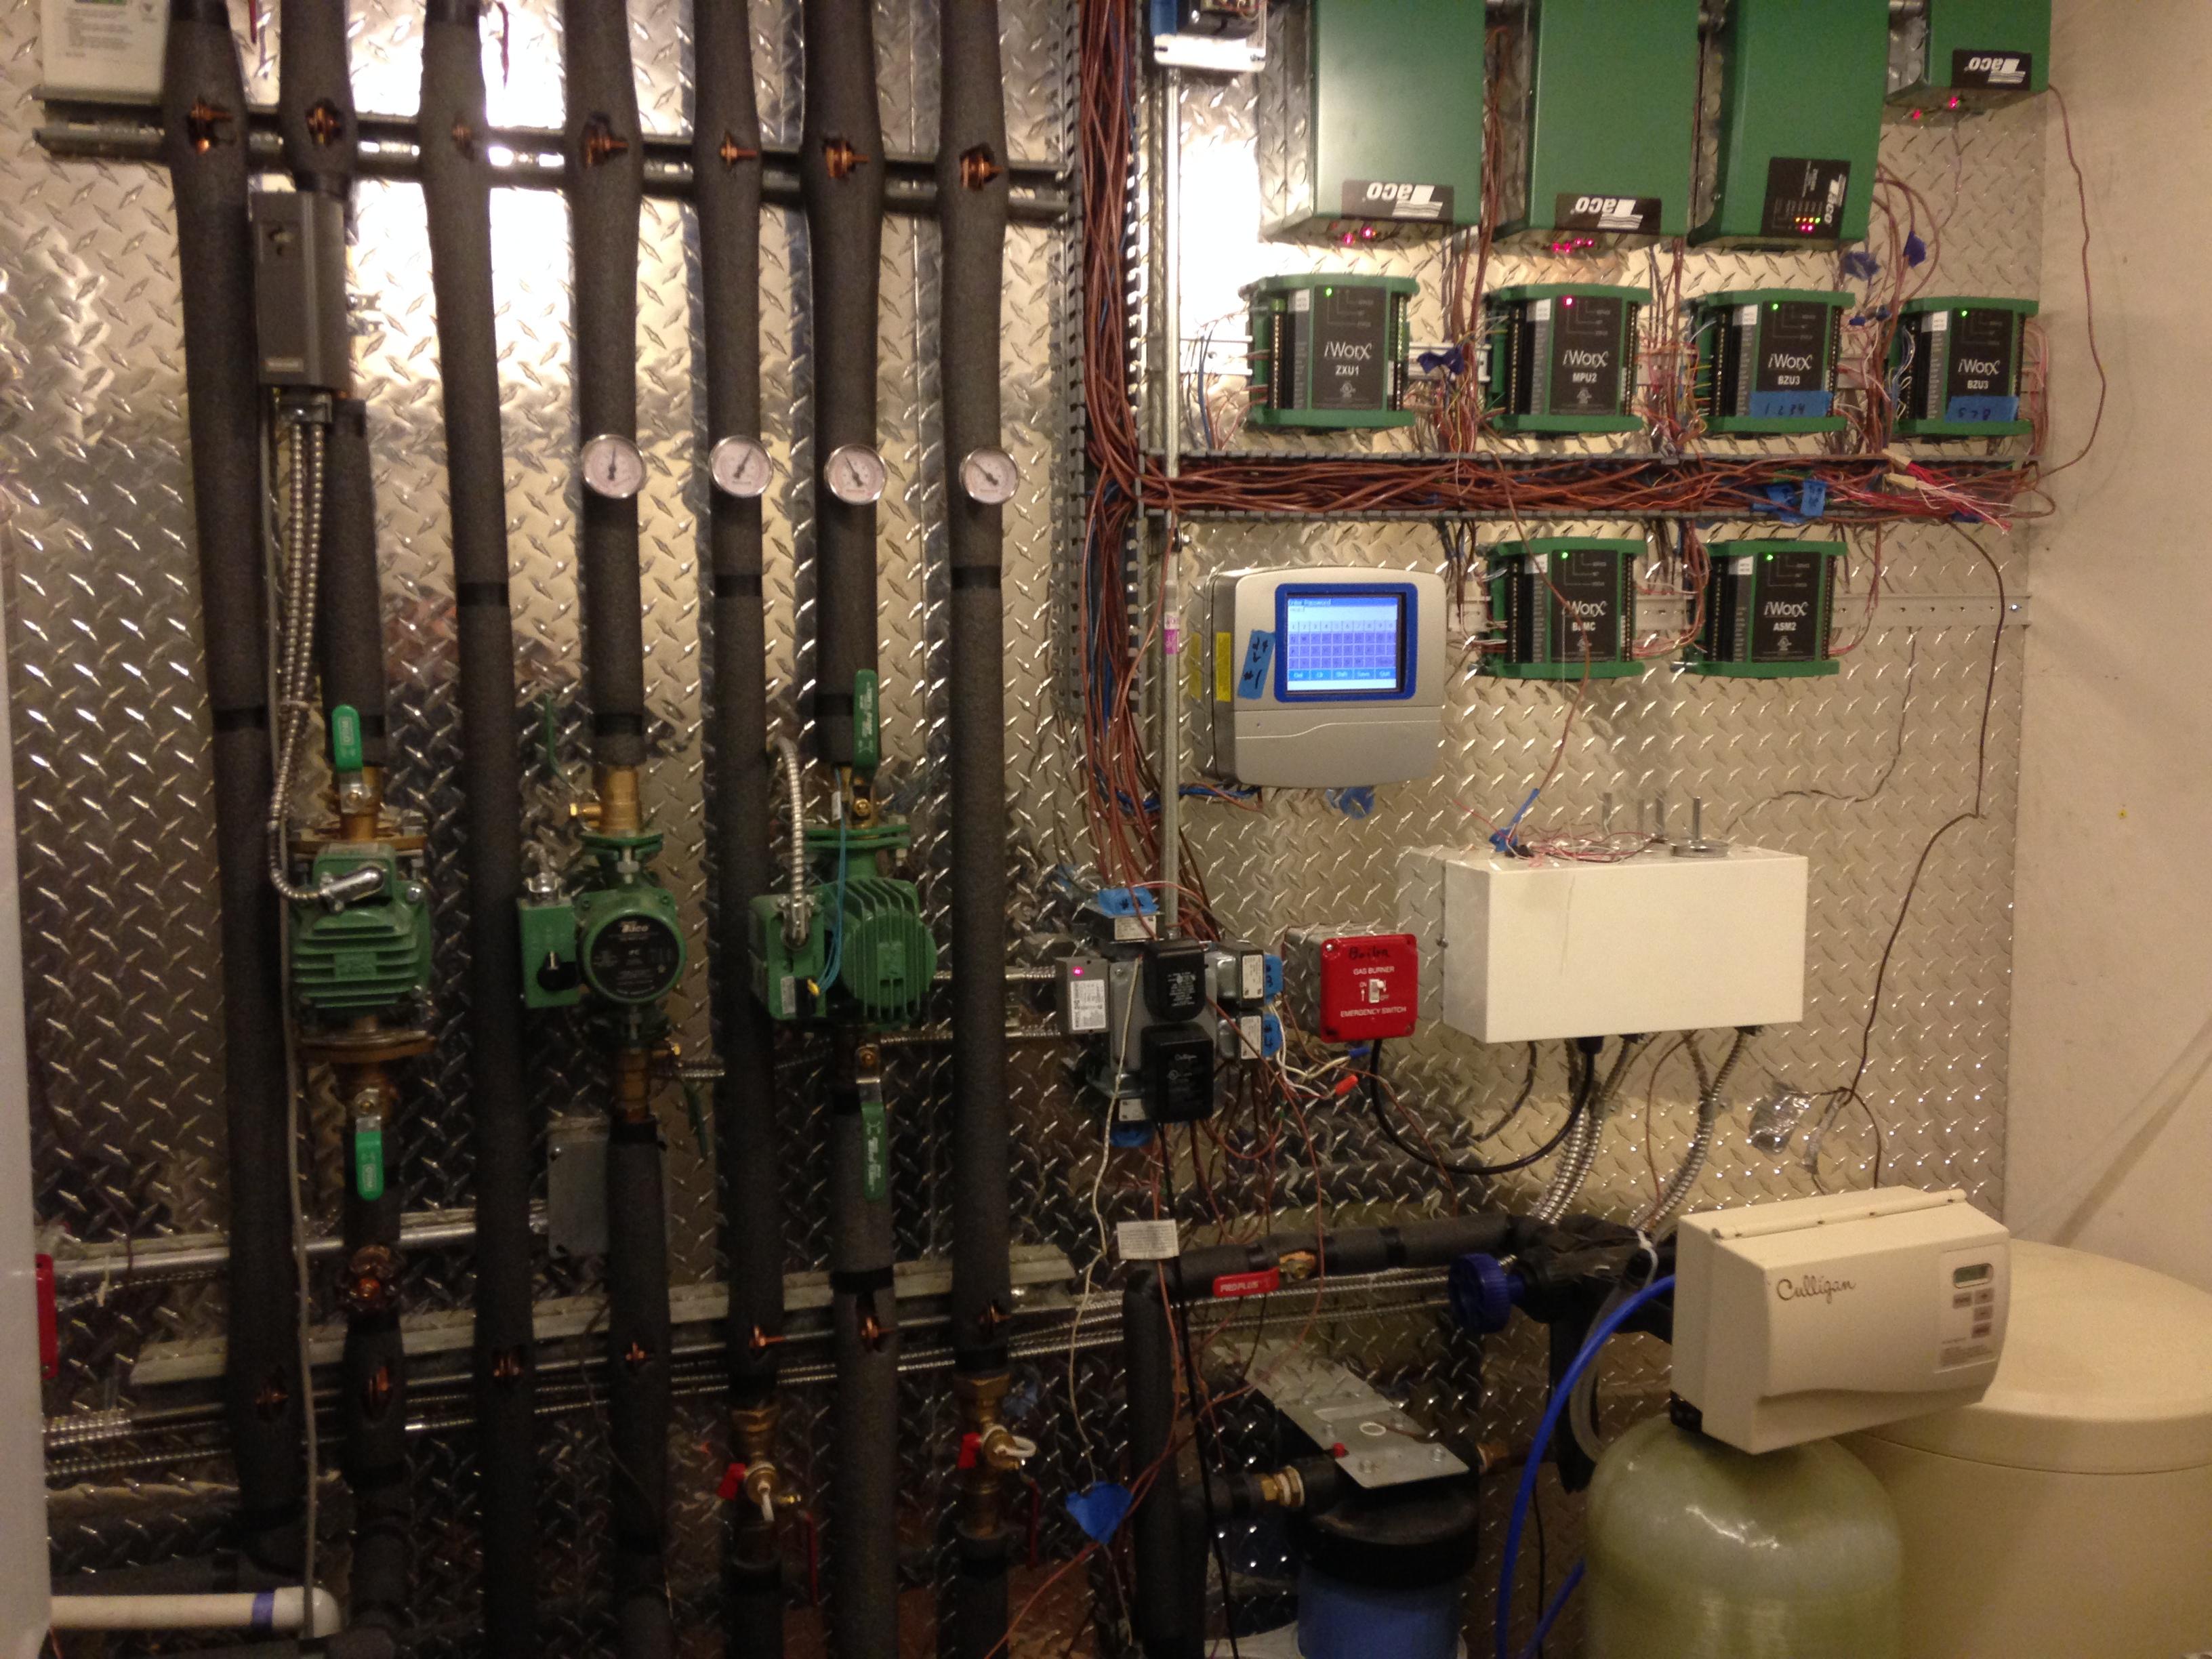 A 2 Z Plumbing Heating Air Inc image 1